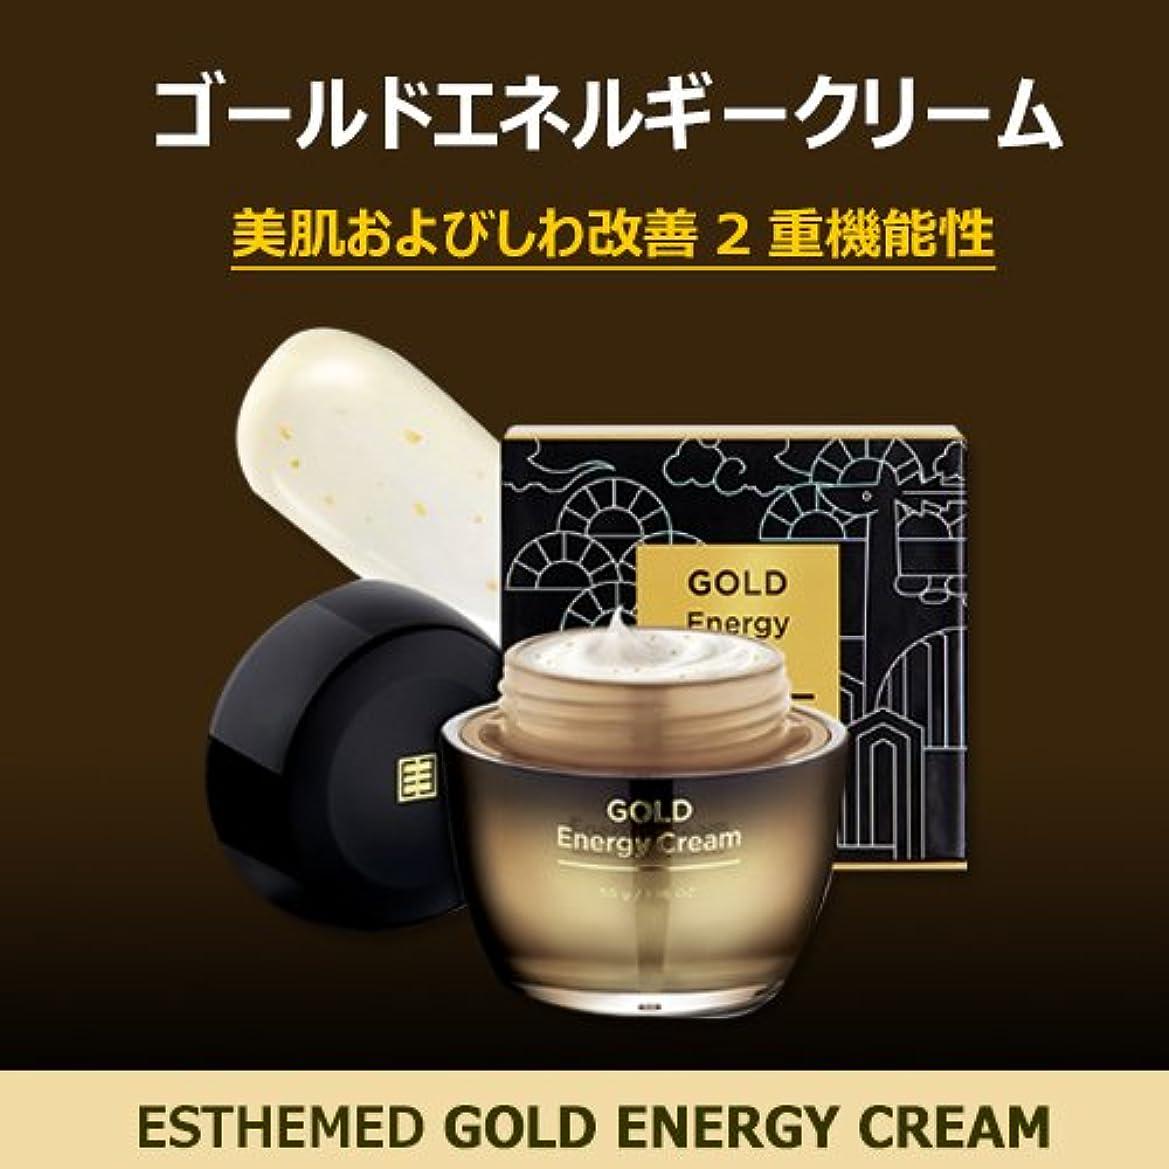 ESTHEMED エステメド ゴールド エネルギー クリーム GOLD Energy Cream 50g 【 シワ改善 美肌 保湿 回復 韓国コスメ 】